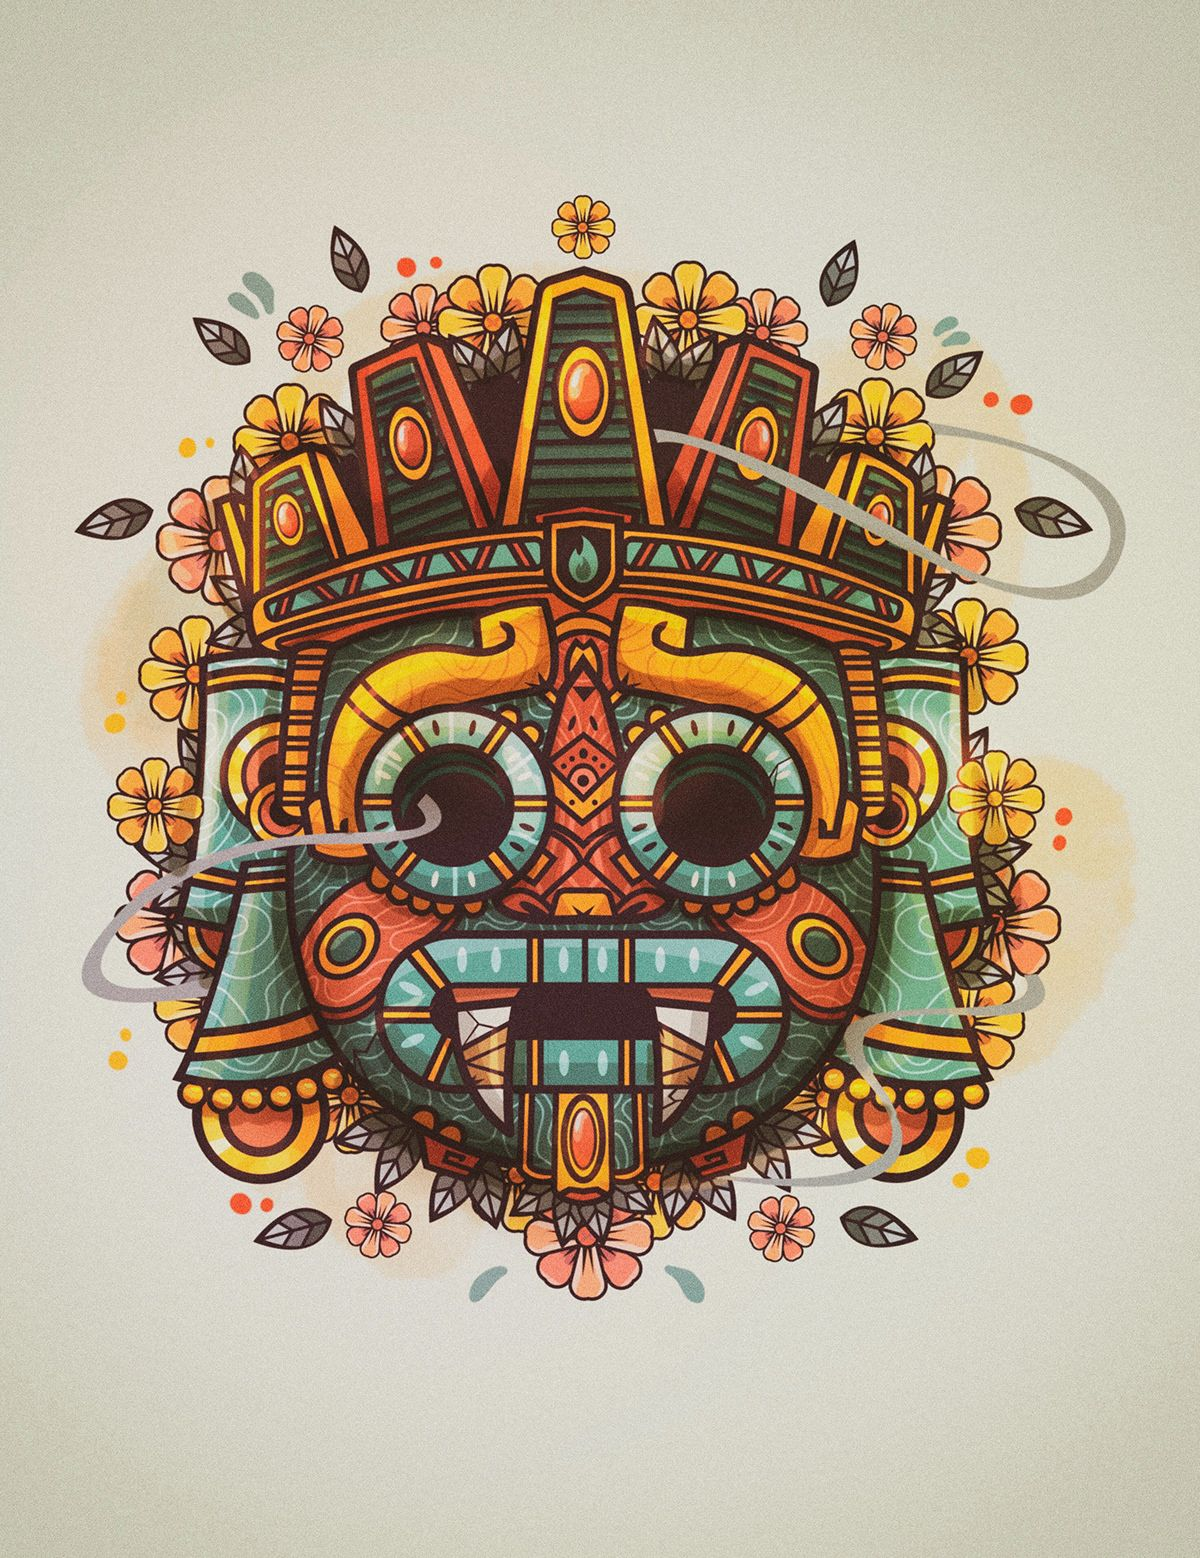 Pin By Tate Bailey On Tattoos Aztec Art Mayan Art Mexican Art Tattoos